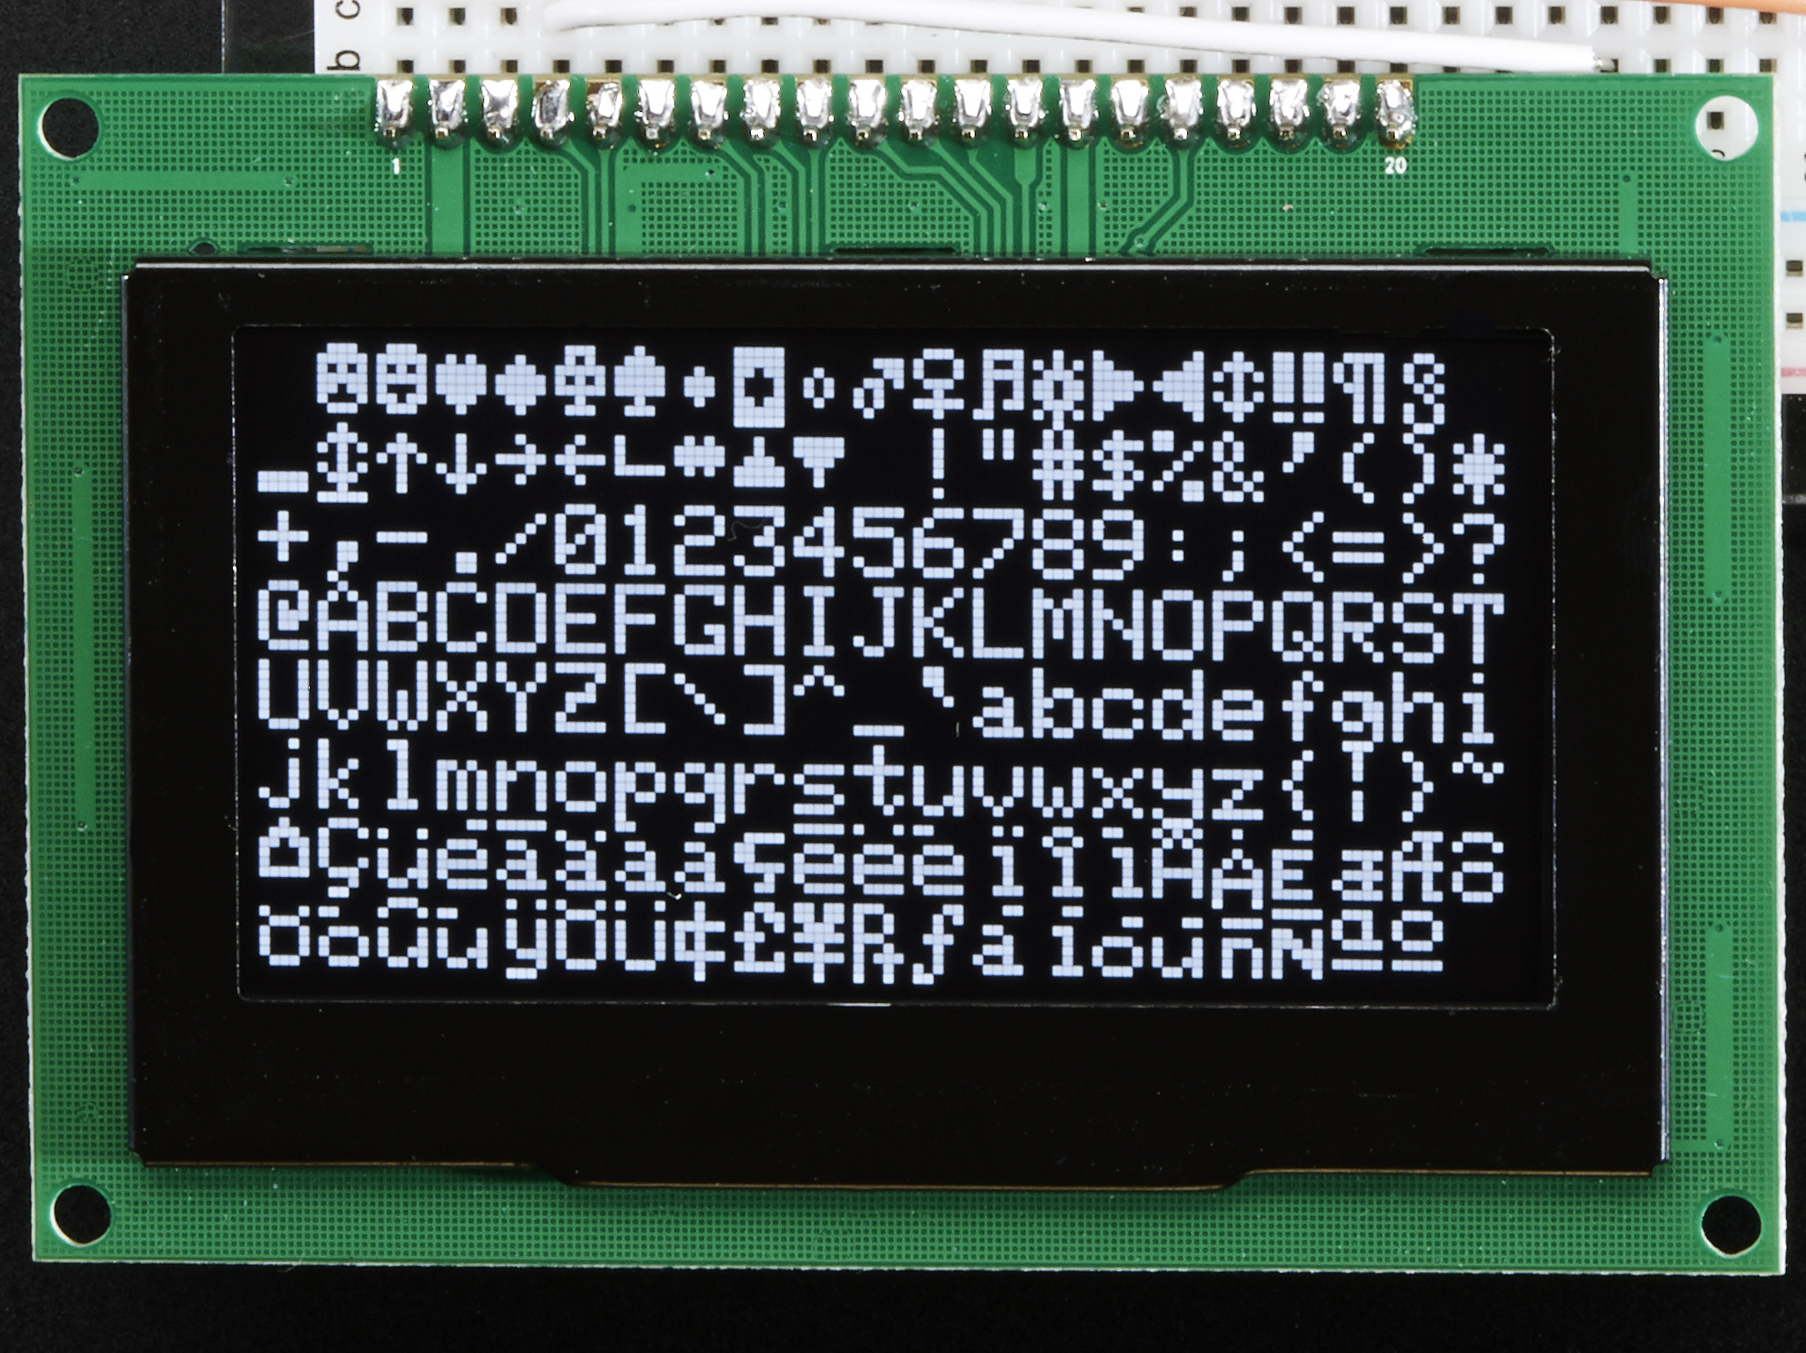 adafruit_products_2674_screen_10_CROP.jpg